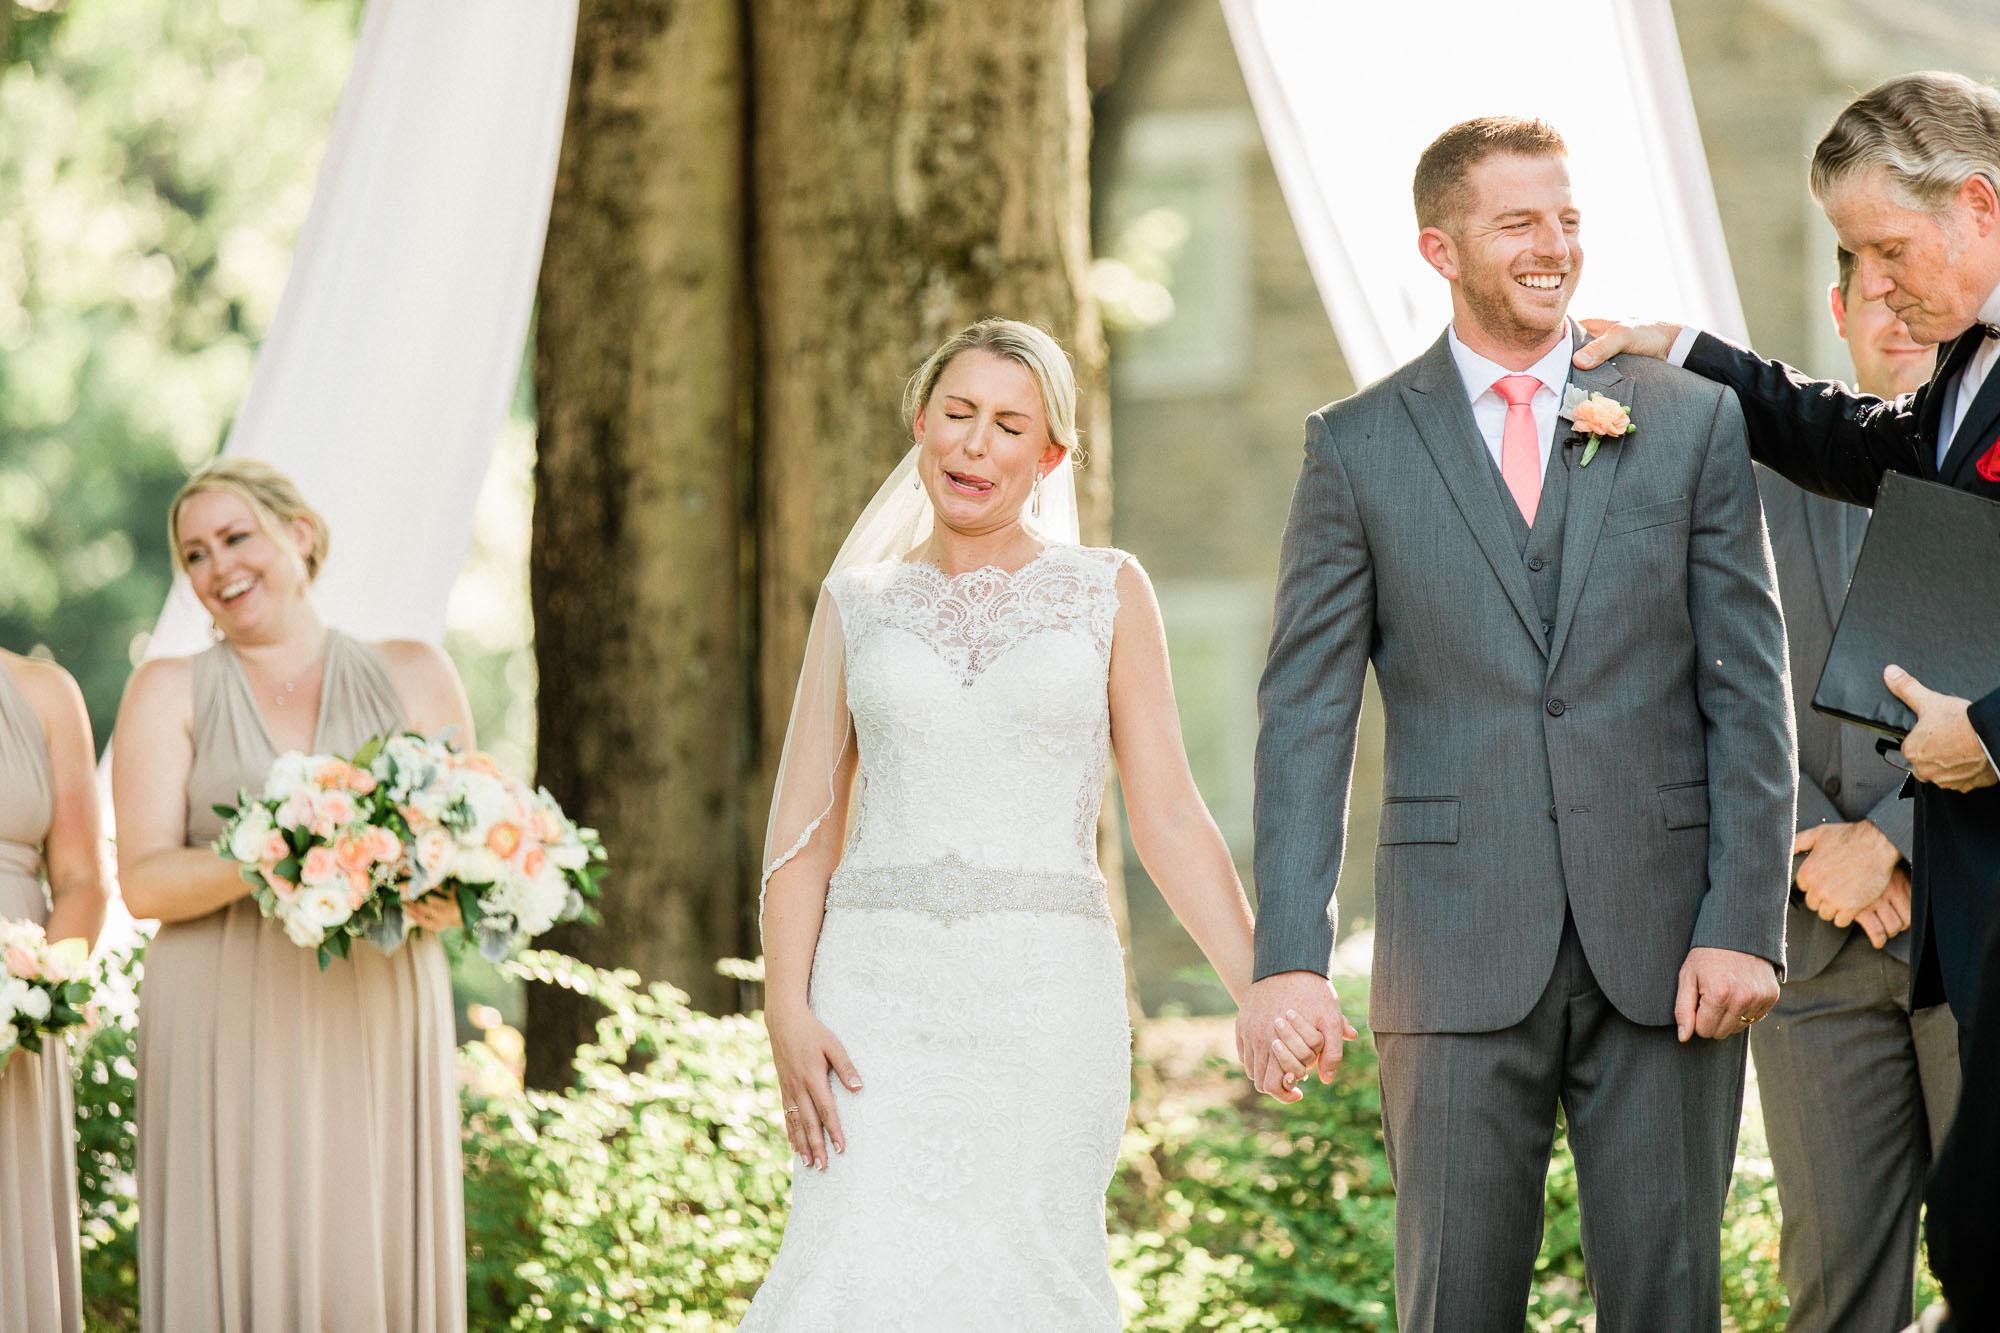 Allenberry-resort-historic-pennsylvania-wedding-22125.jpg